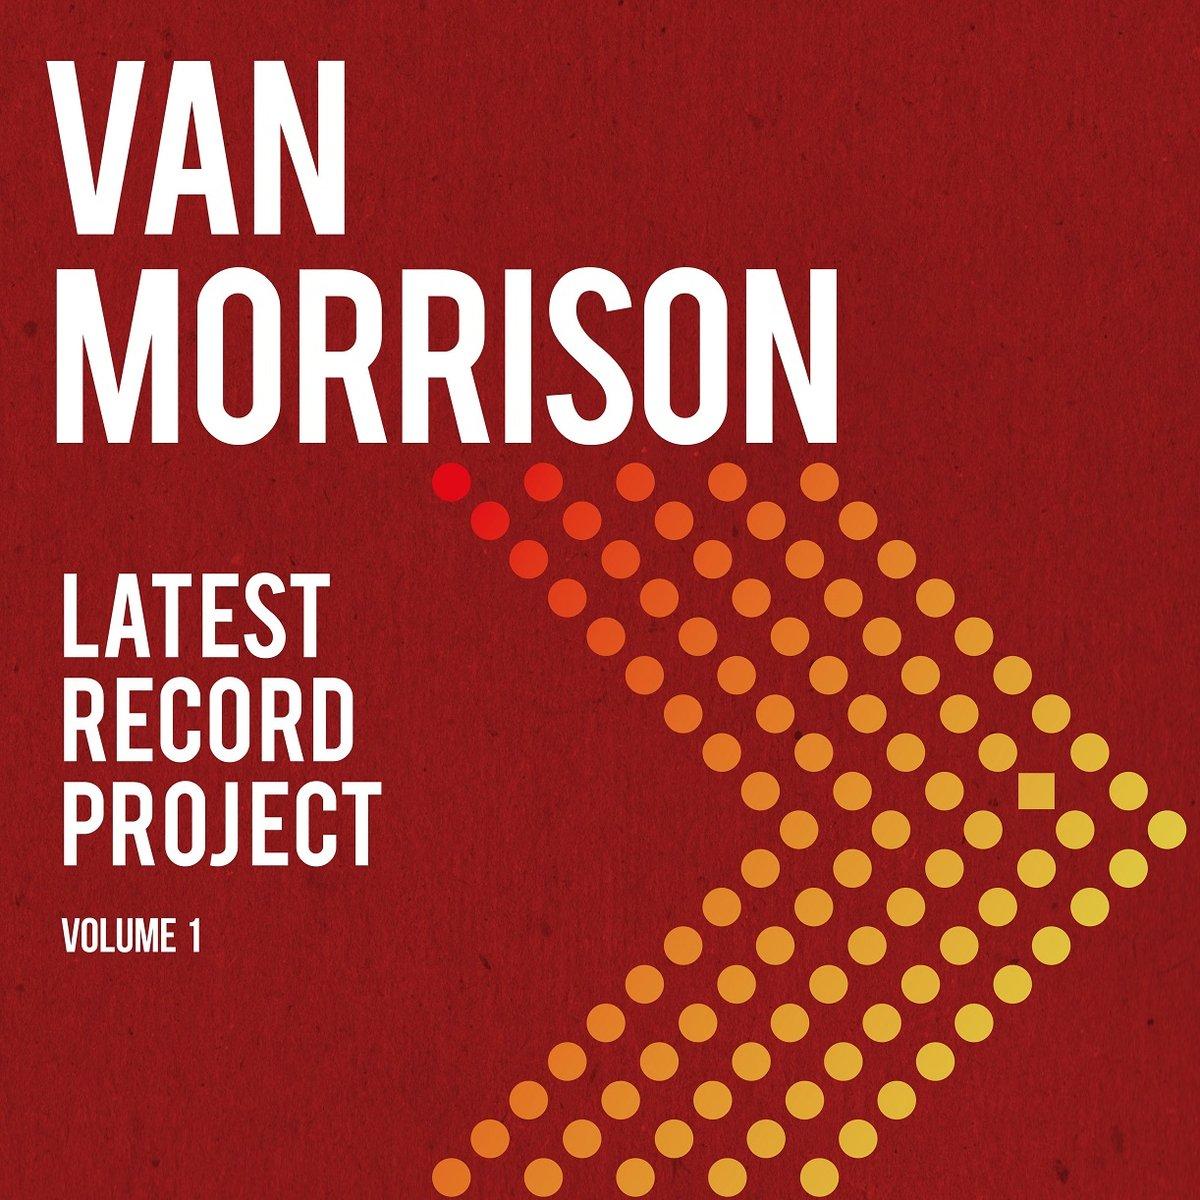 MORRISON VAN – Latest Record Project. Volume 1